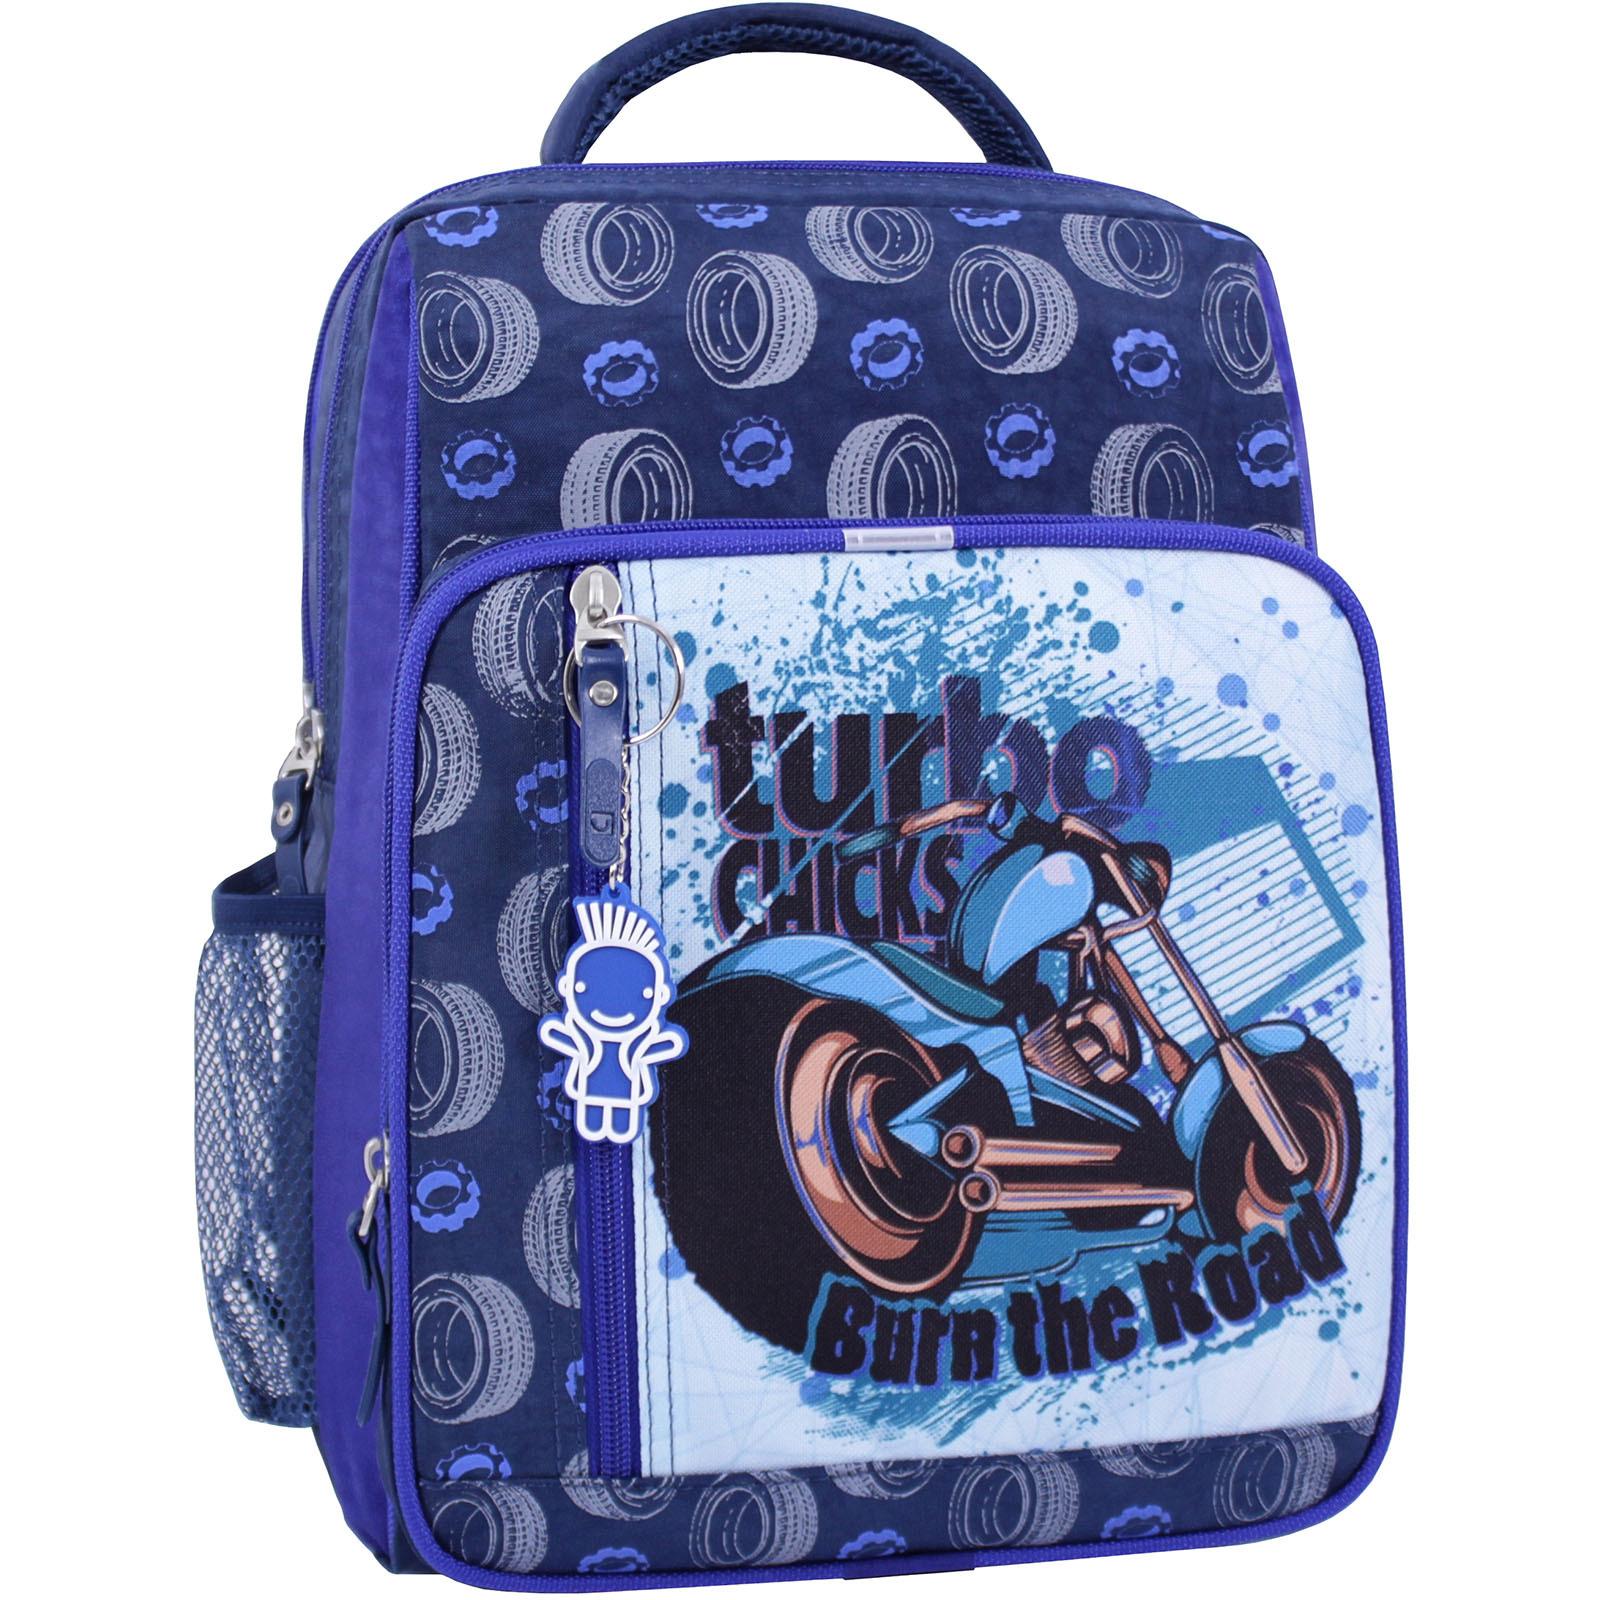 Школьные рюкзаки Рюкзак школьный Bagland Школьник 8 л. синий 551 (0012870) IMG_1006_суб.551_.JPG